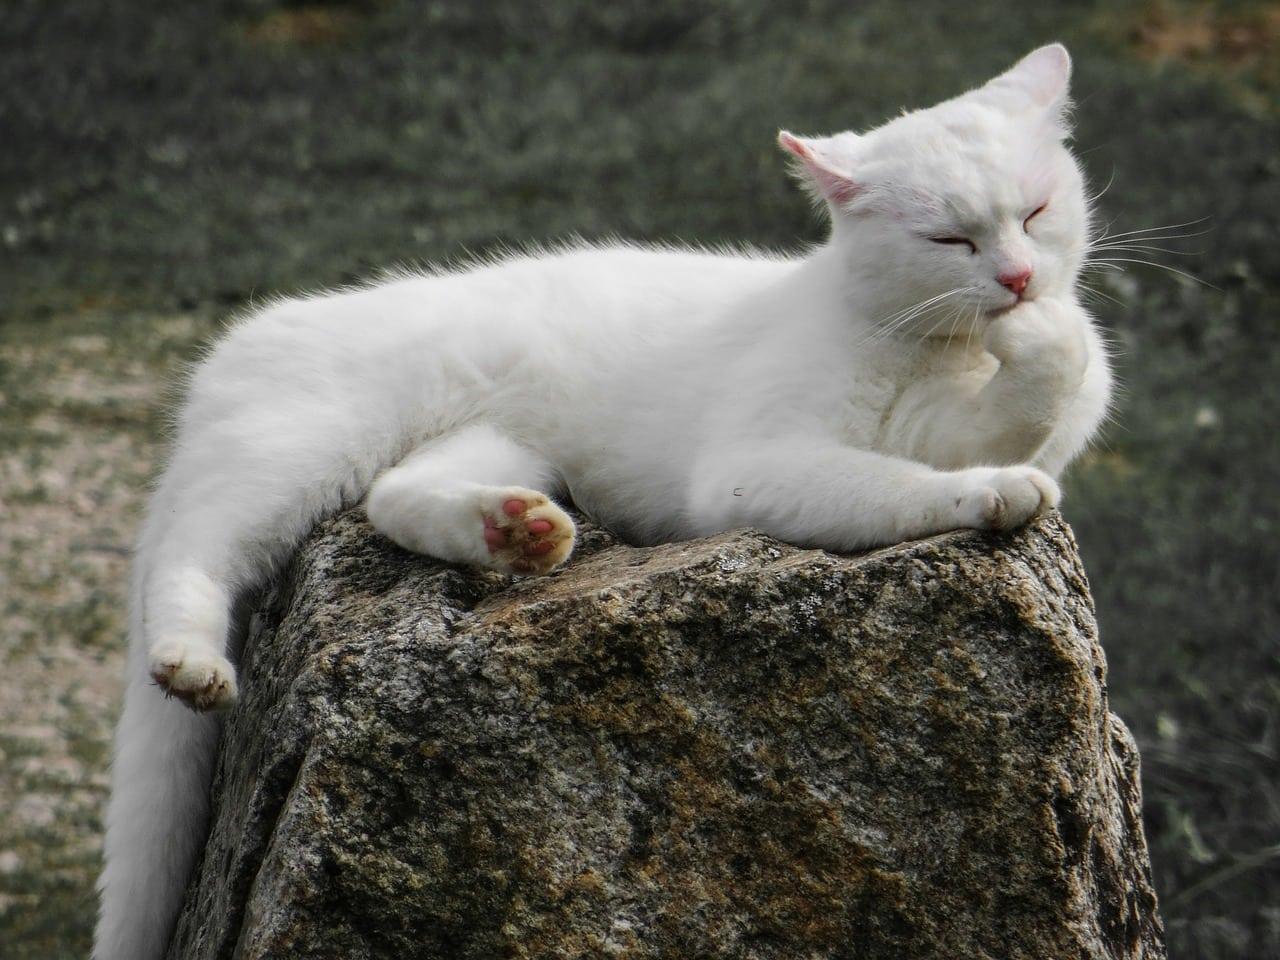 white cat licking itself